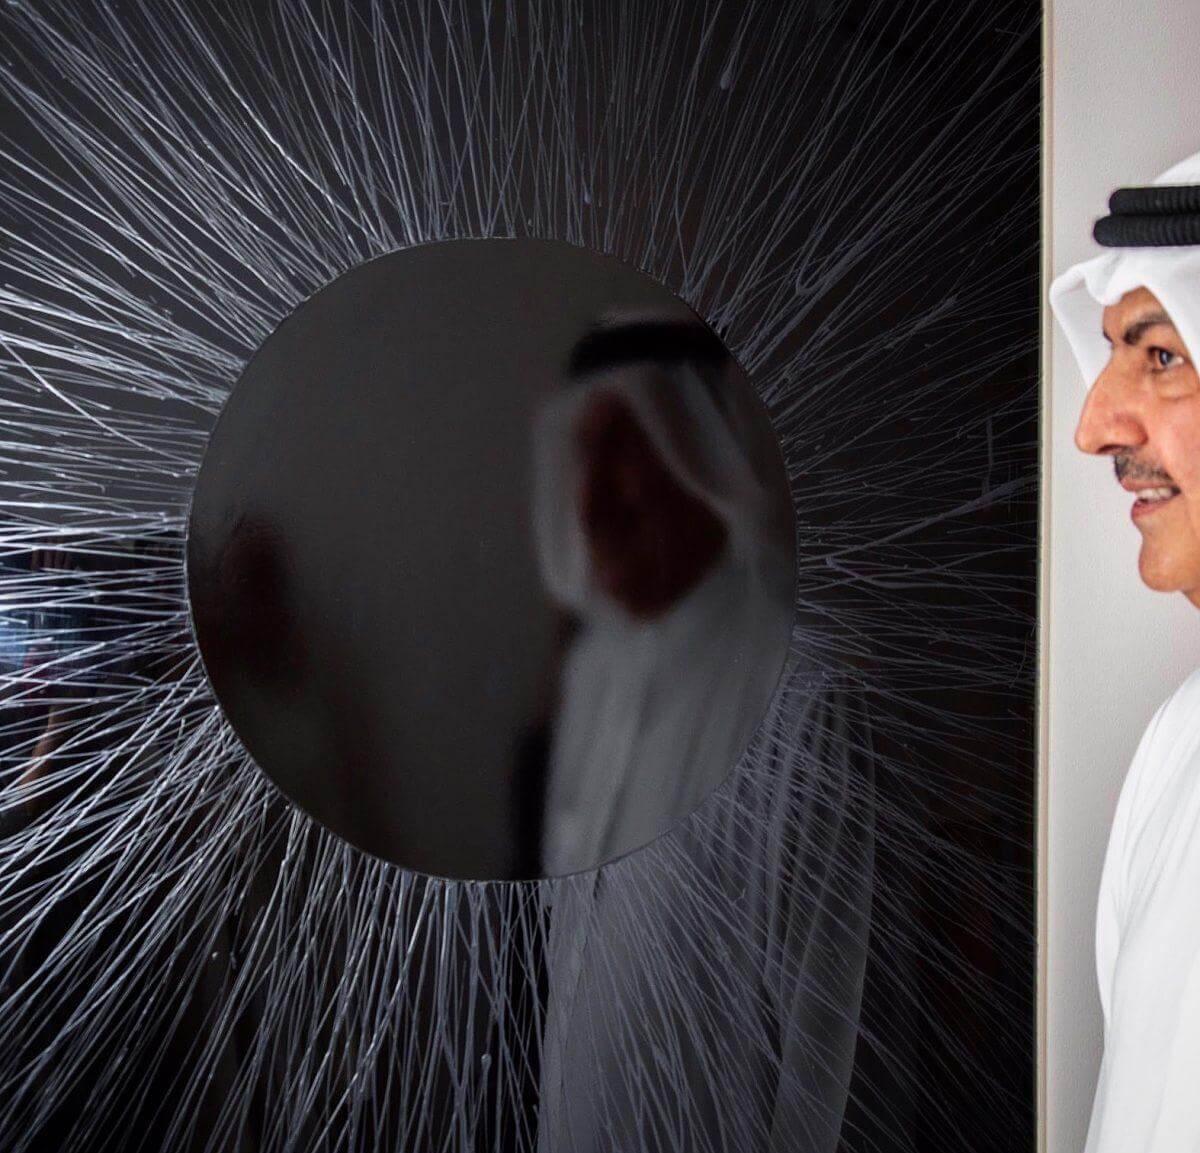 30 Years of Art - Sheikh Rashid Al Khalifa's Evolution of Style